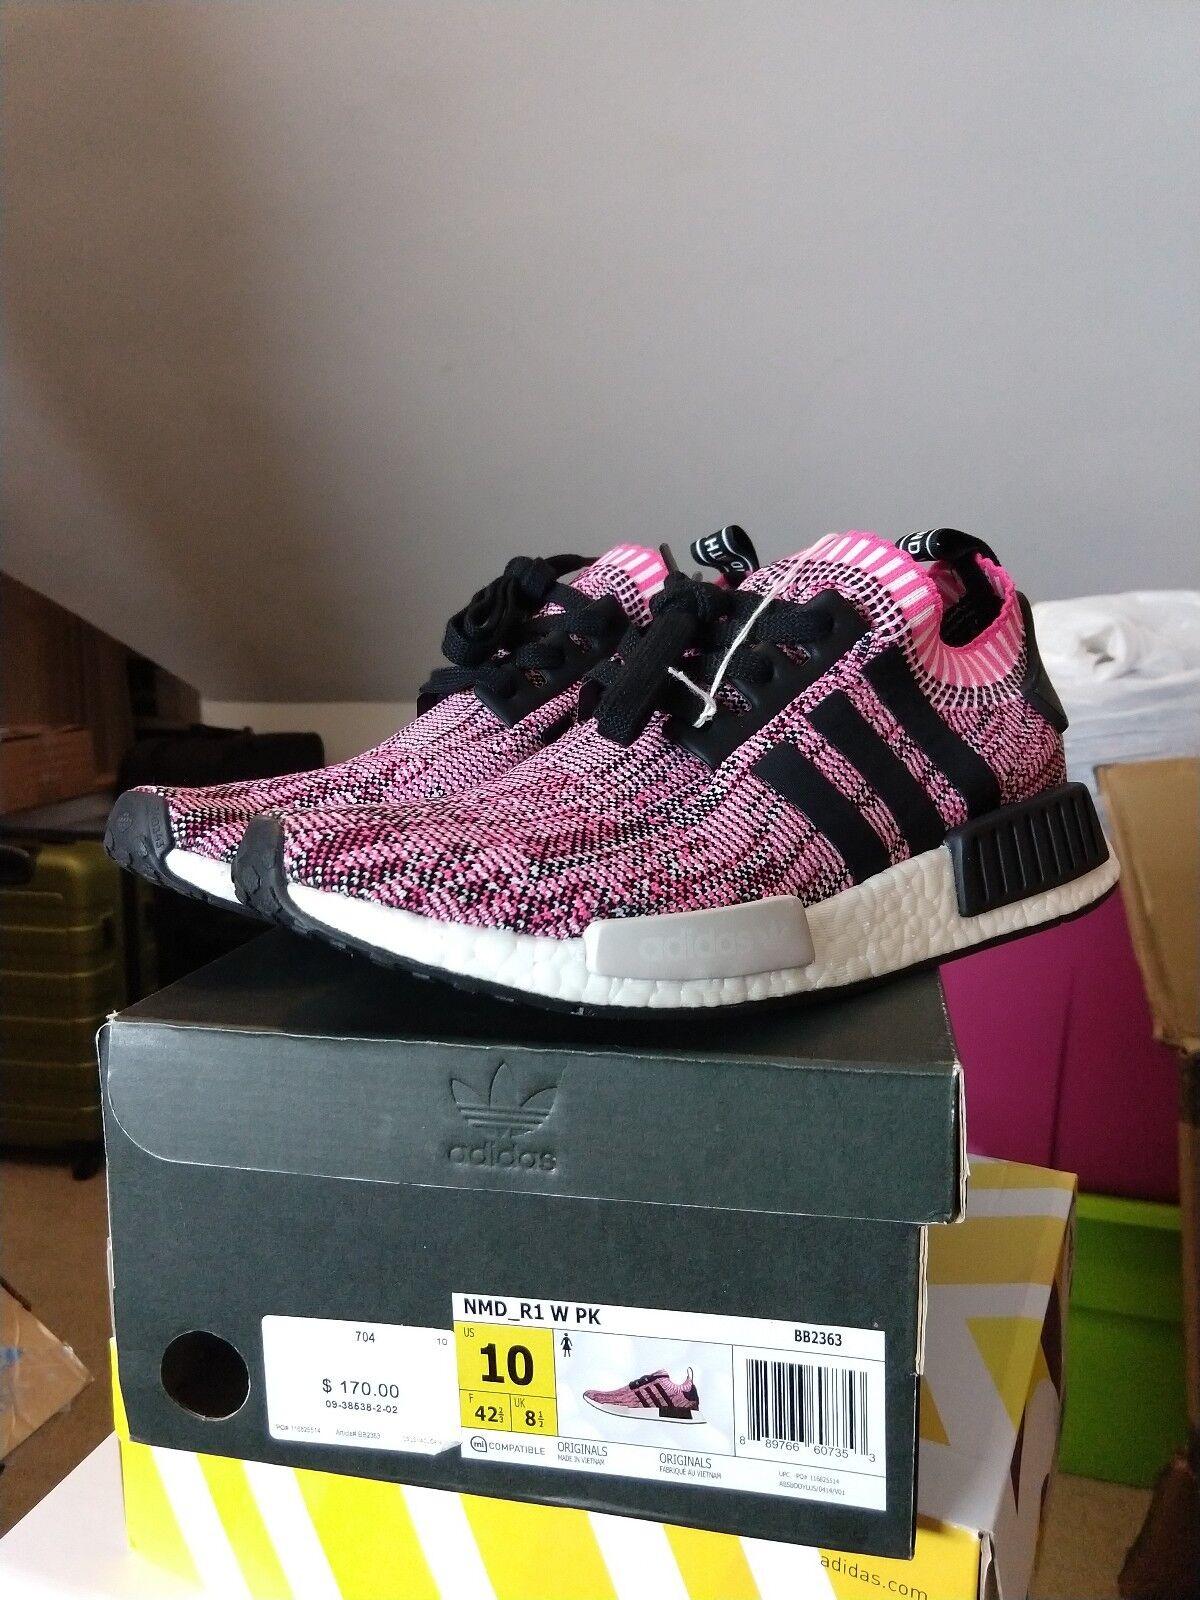 DS Adidas Nmd R1 Pk Pink W Sz 10 bb2363 boost